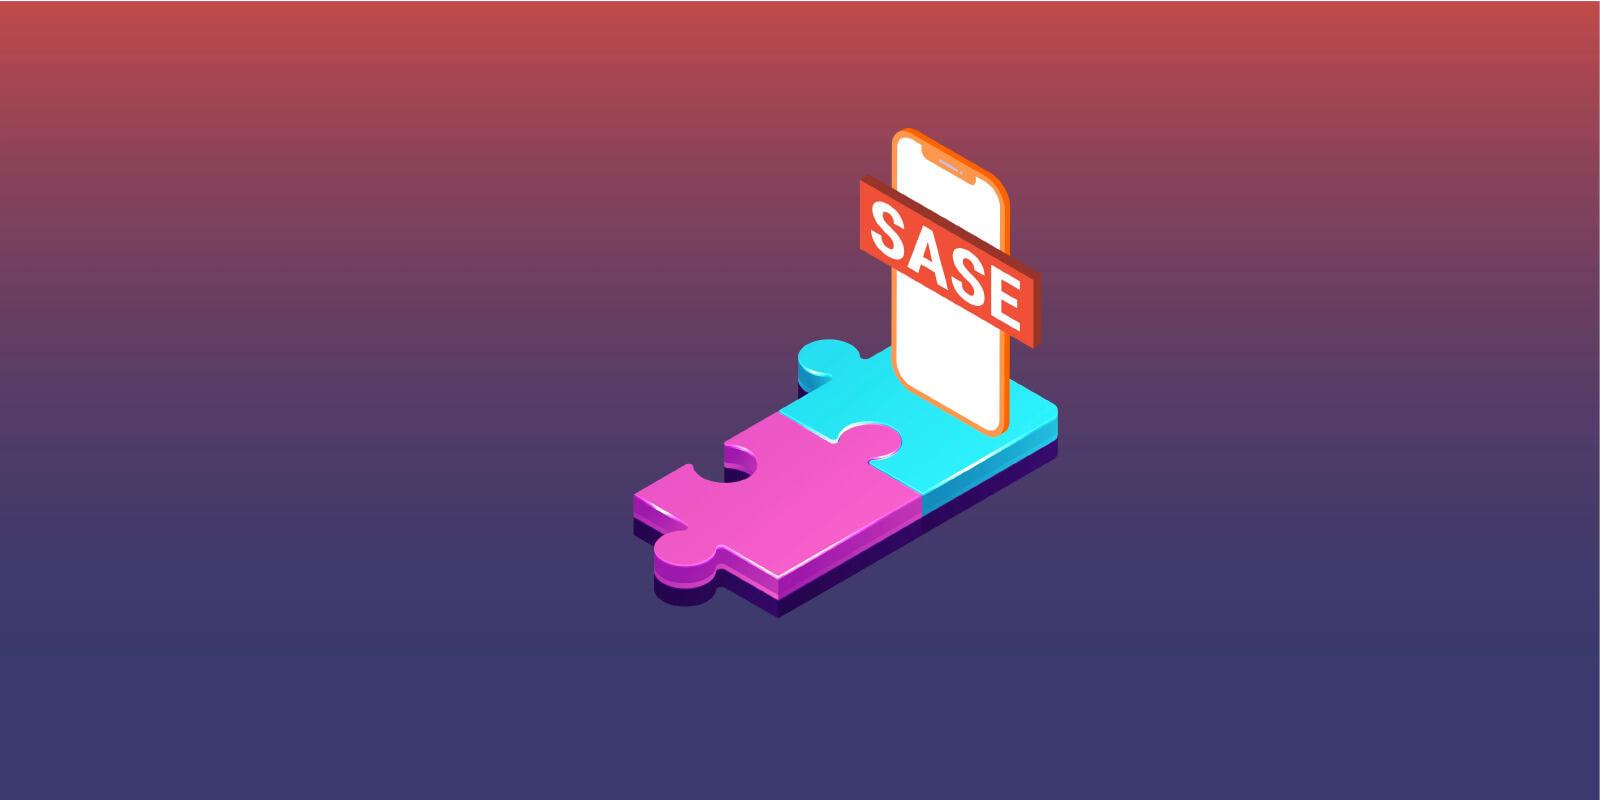 SASE ( Secure Access Service Edge )